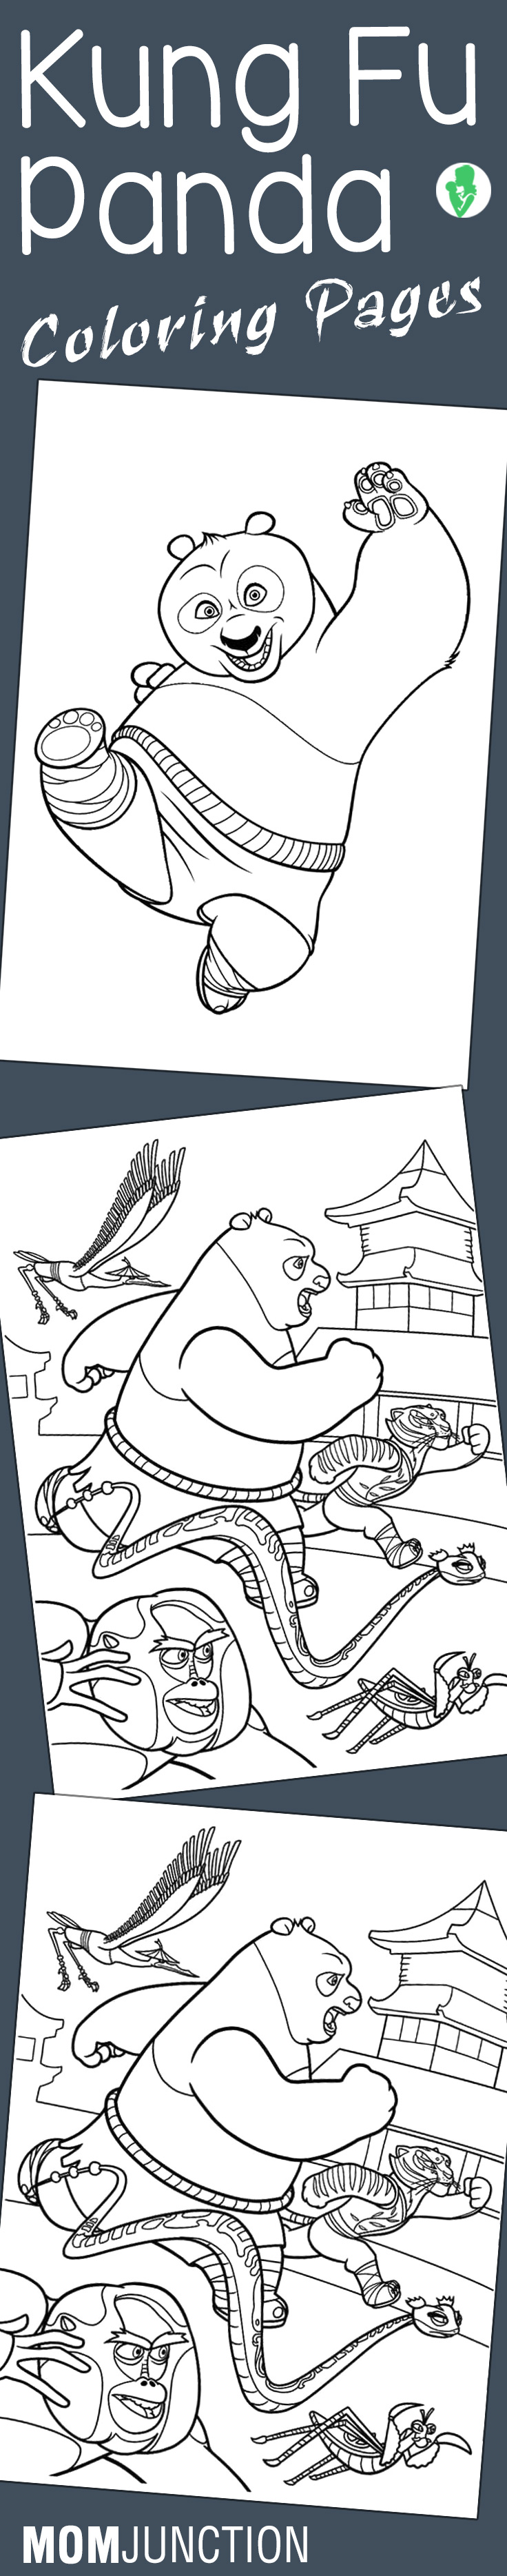 Top 10 Free Printable Kung Fu Panda Coloring Pages Online Kung